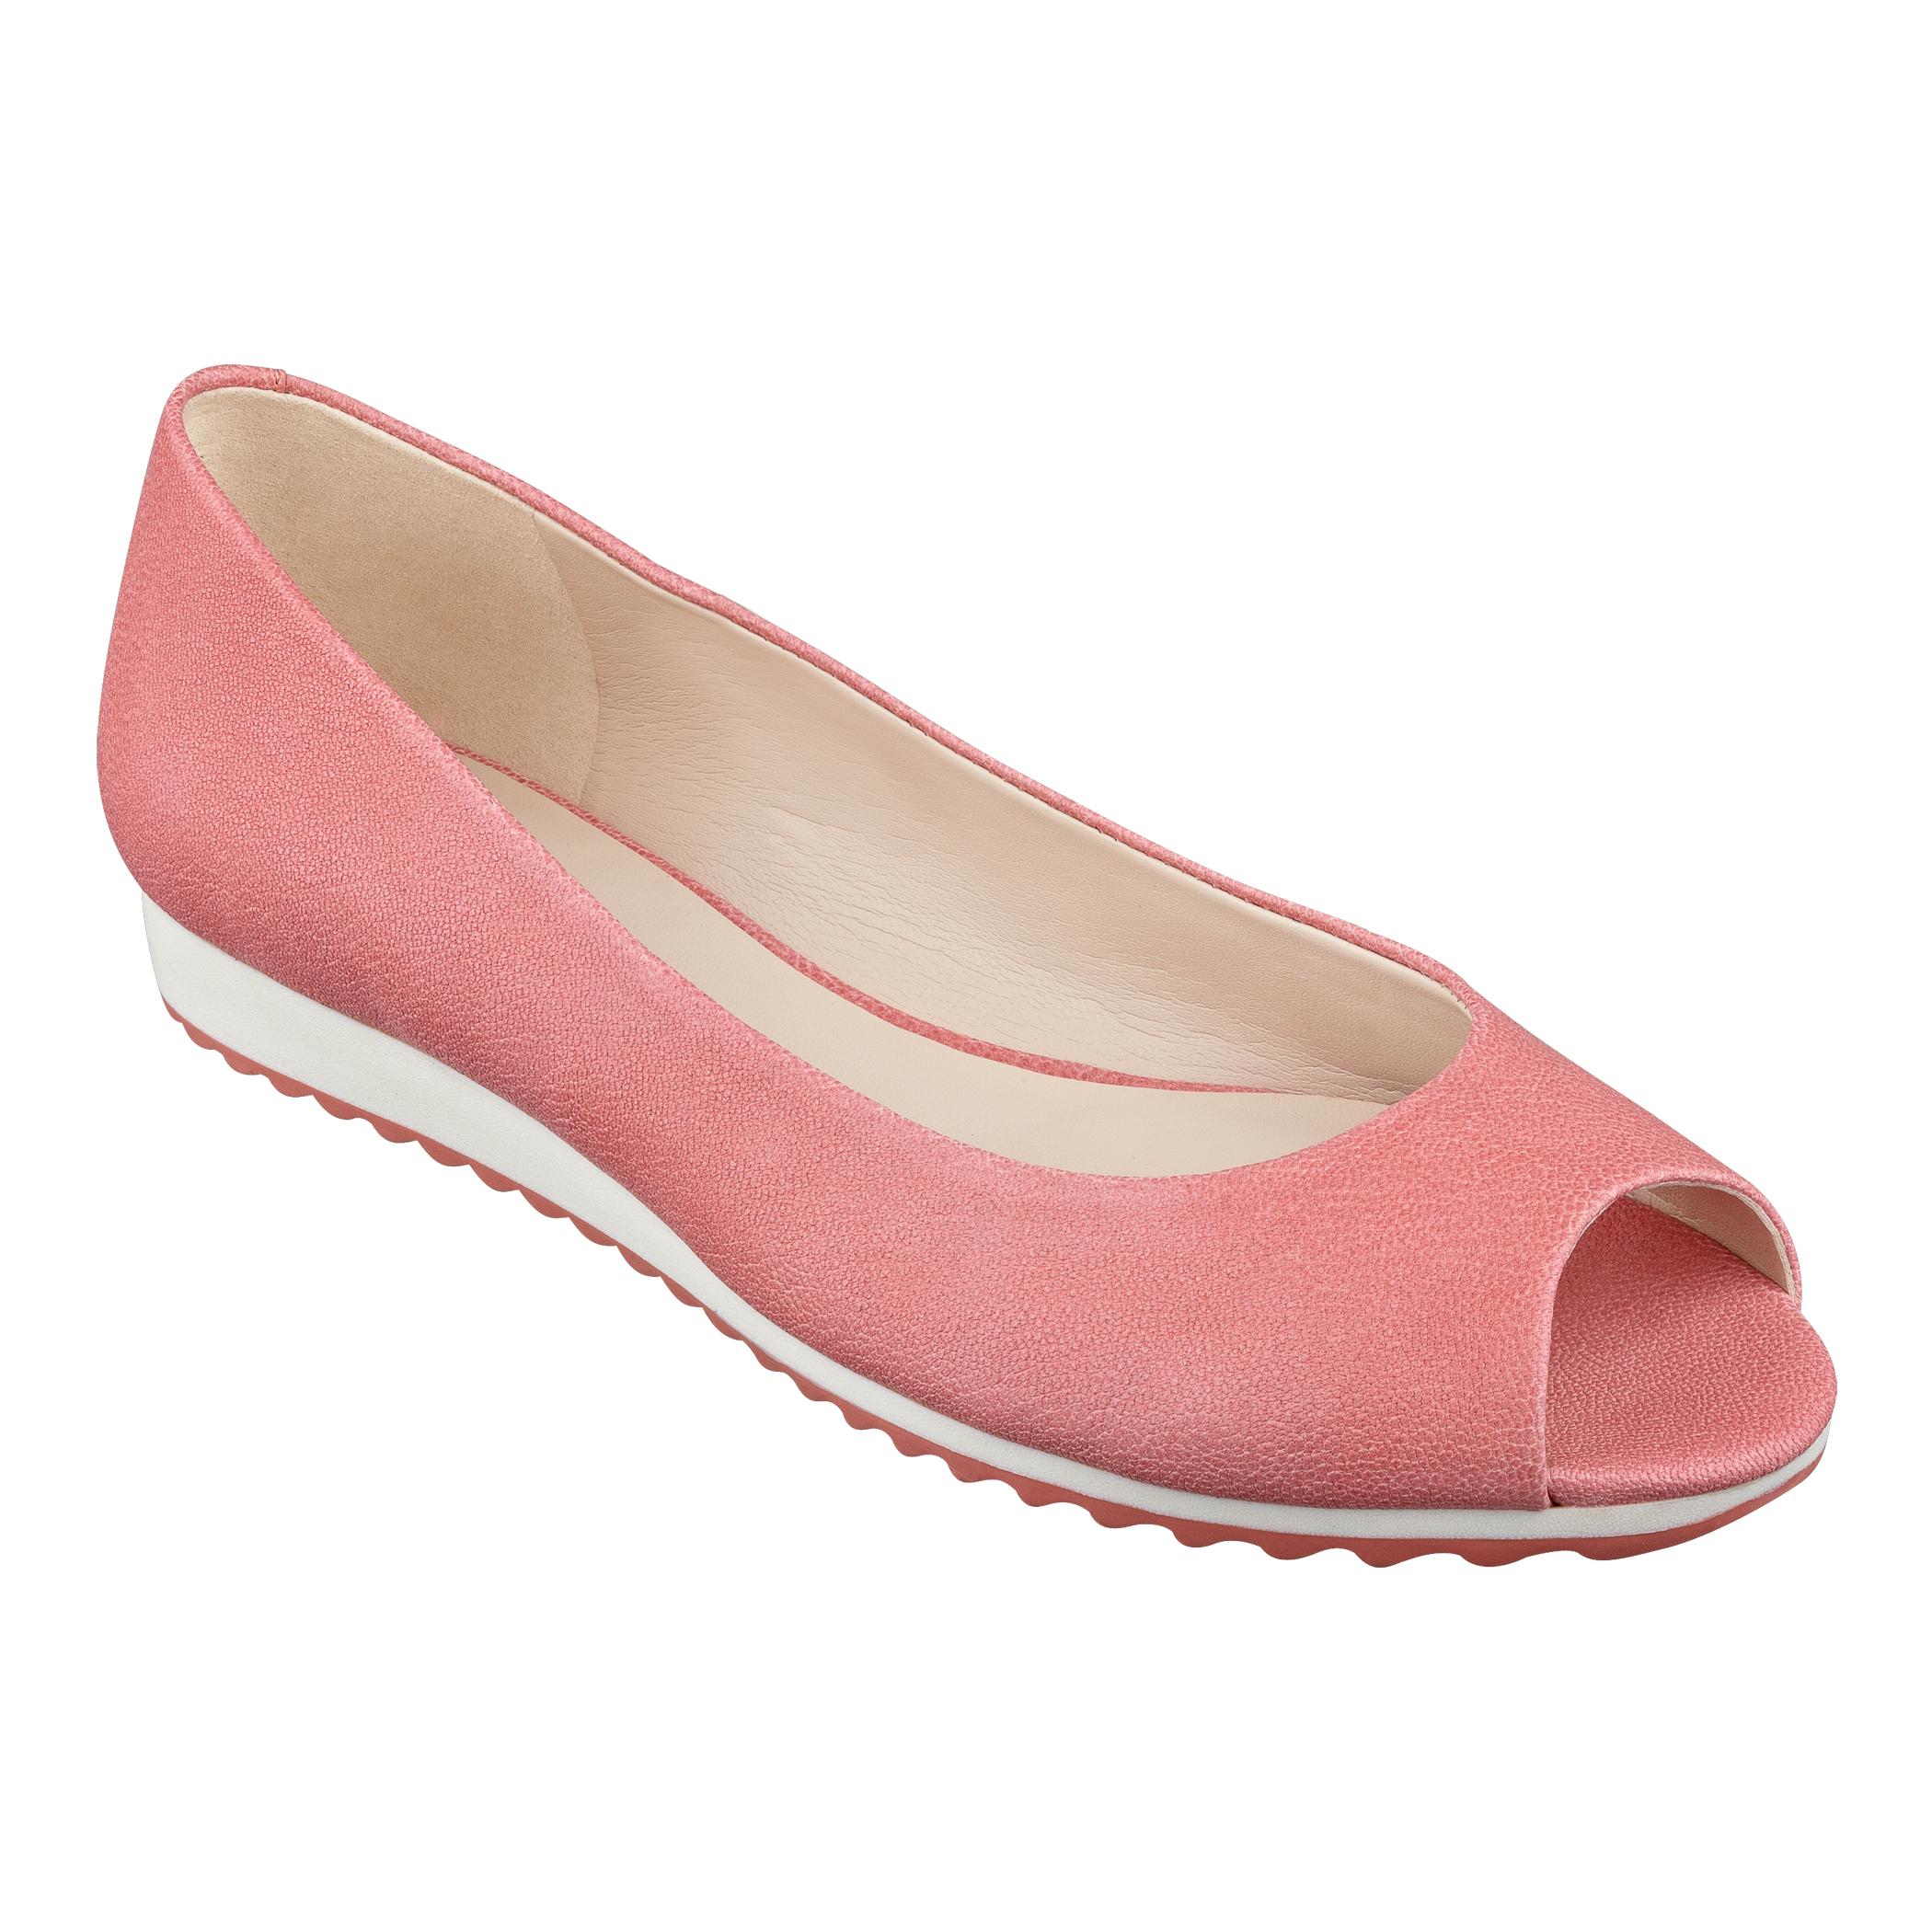 Womens Leather Peep Toe Flat Shoes